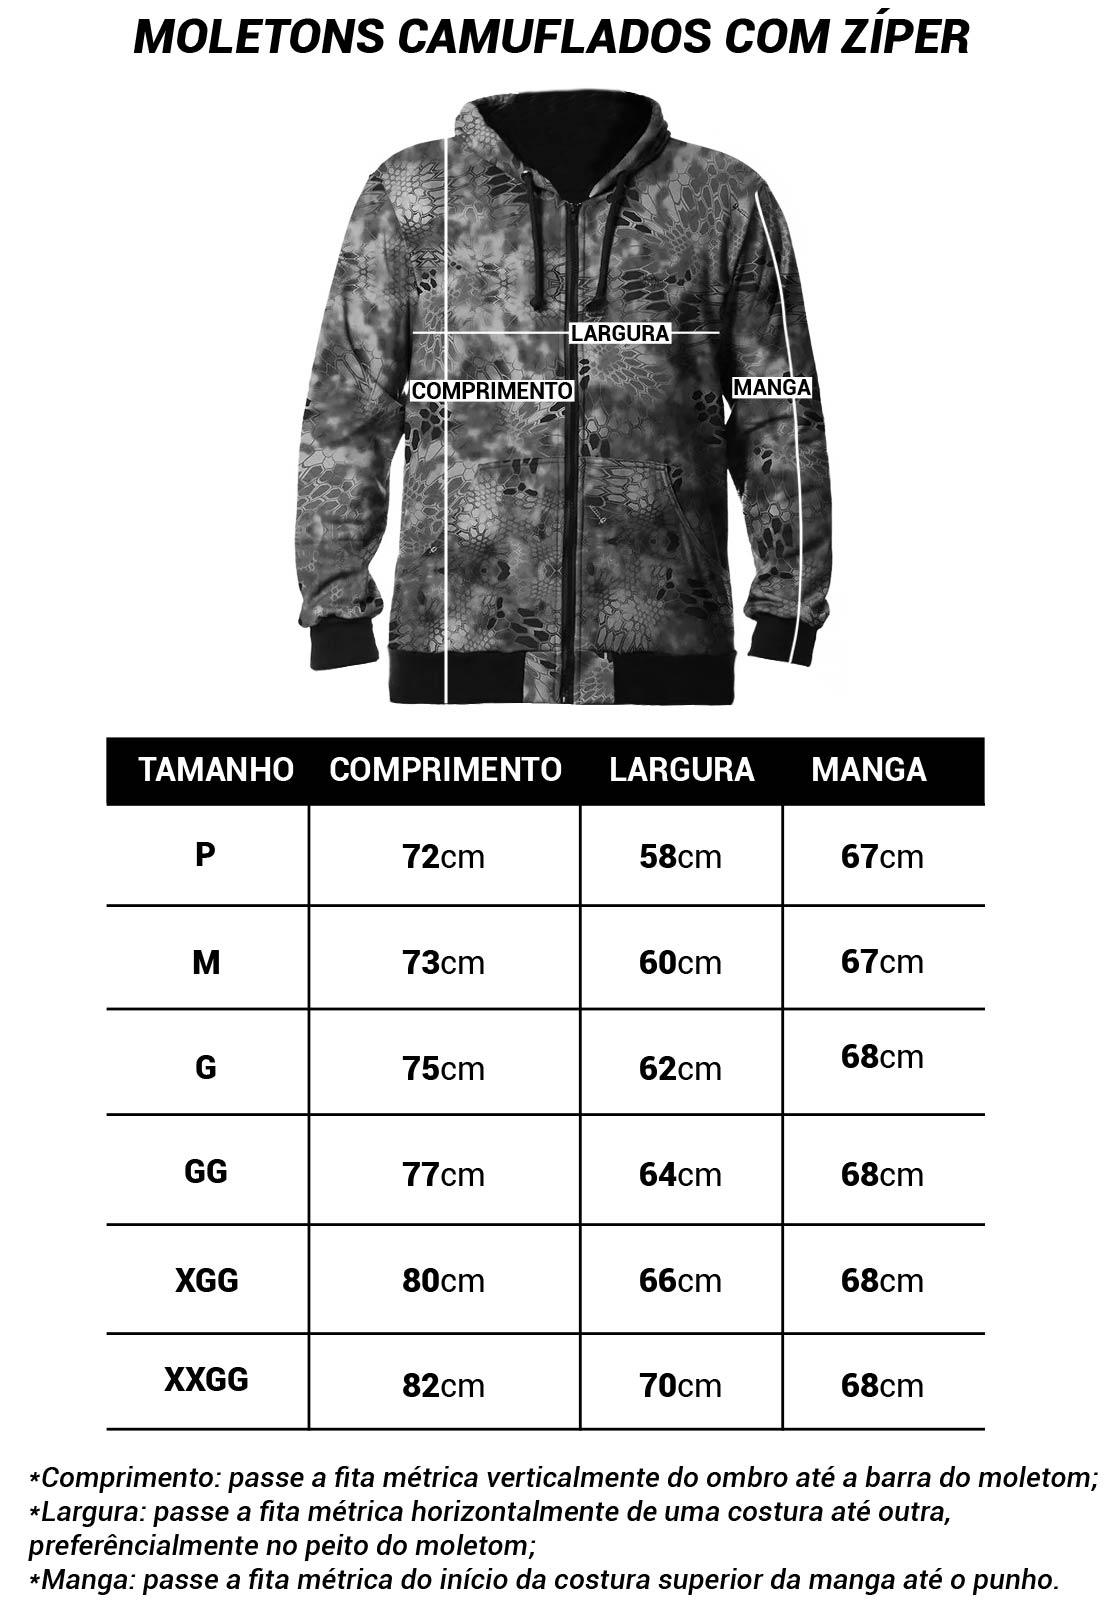 MOLETOM CAMUFLADO PALHADA MASCULINO ABERTO  - Real Hunter